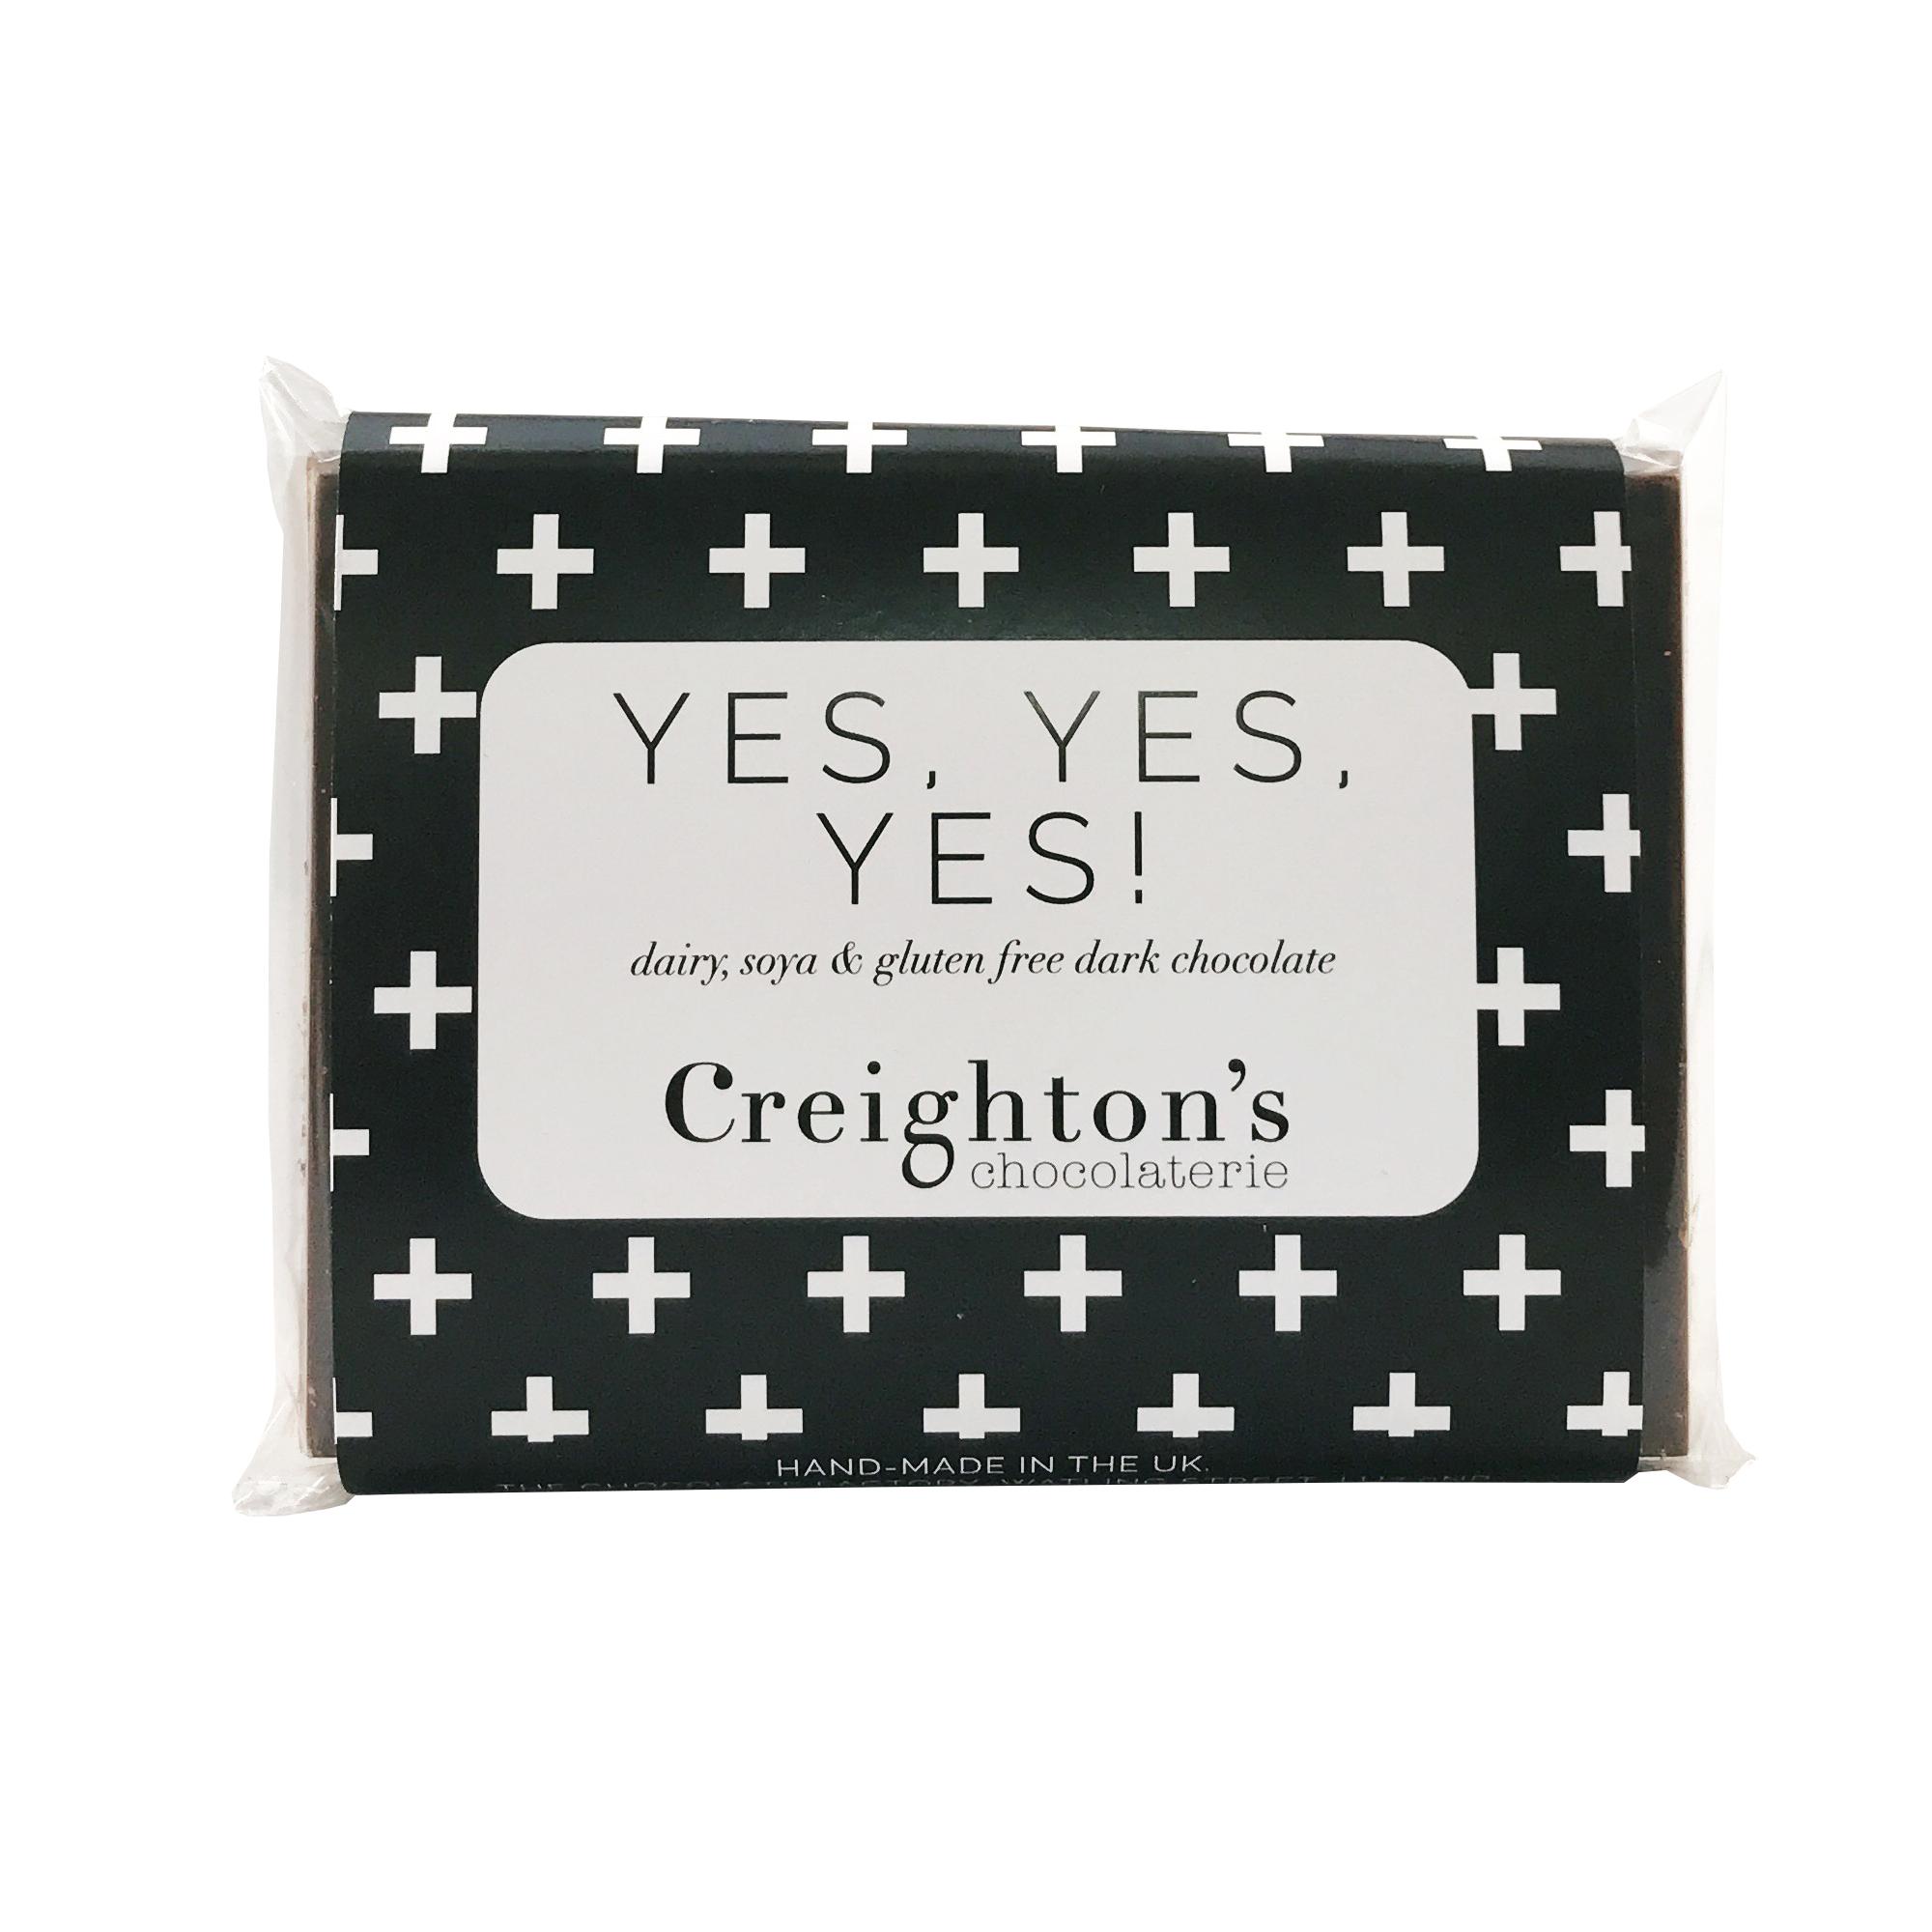 Yes Yes Yes Gluten Soya Free Dark Chocolate Bar Sale Creightons Chocolaterie